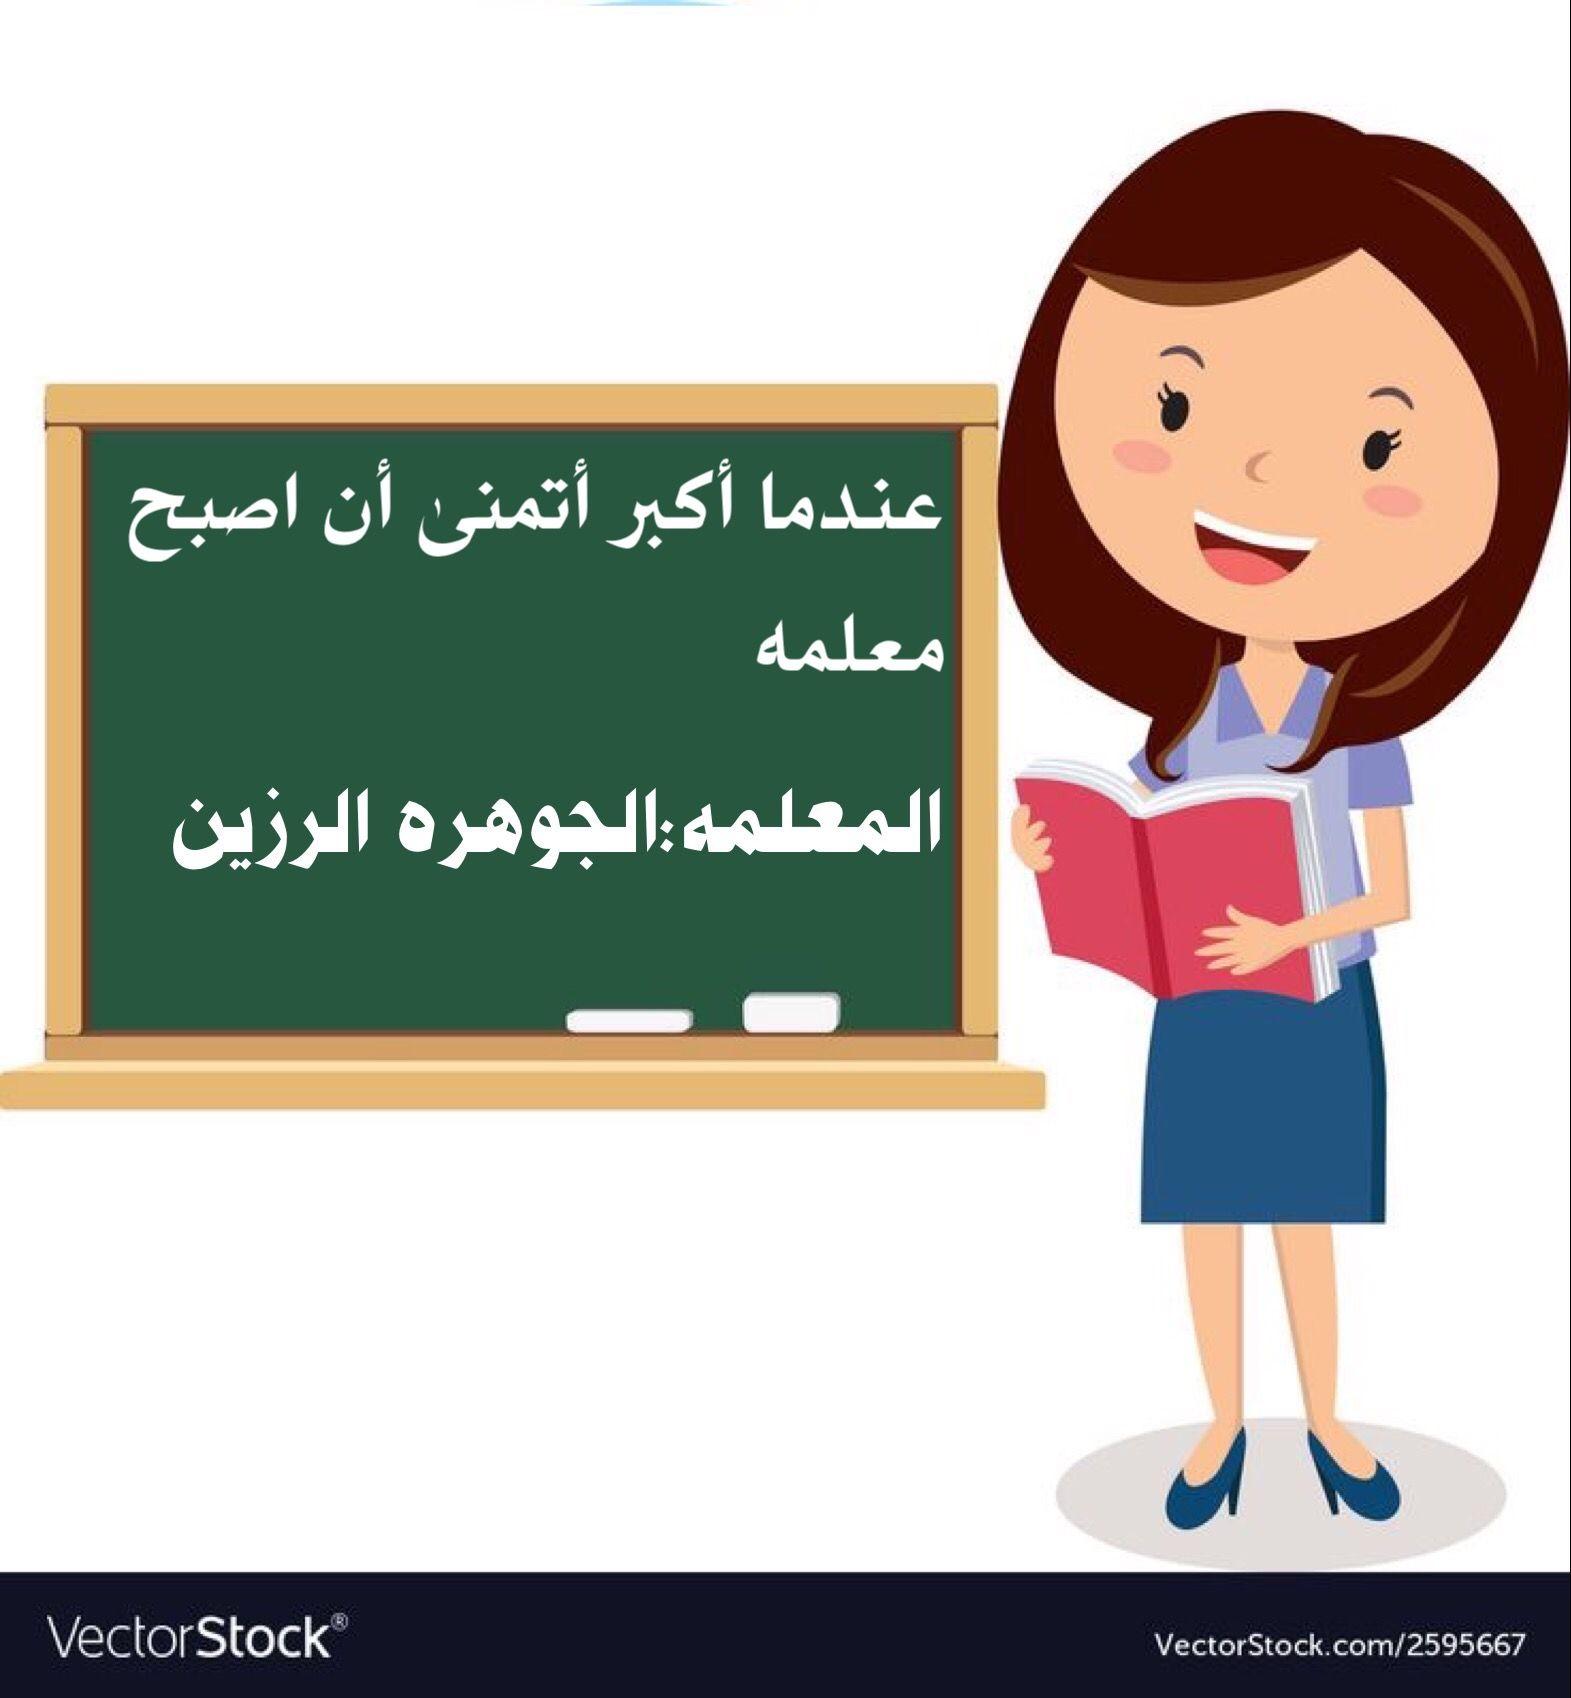 Pin By Haya Al Salom On Arabic Fictional Characters Character Family Guy